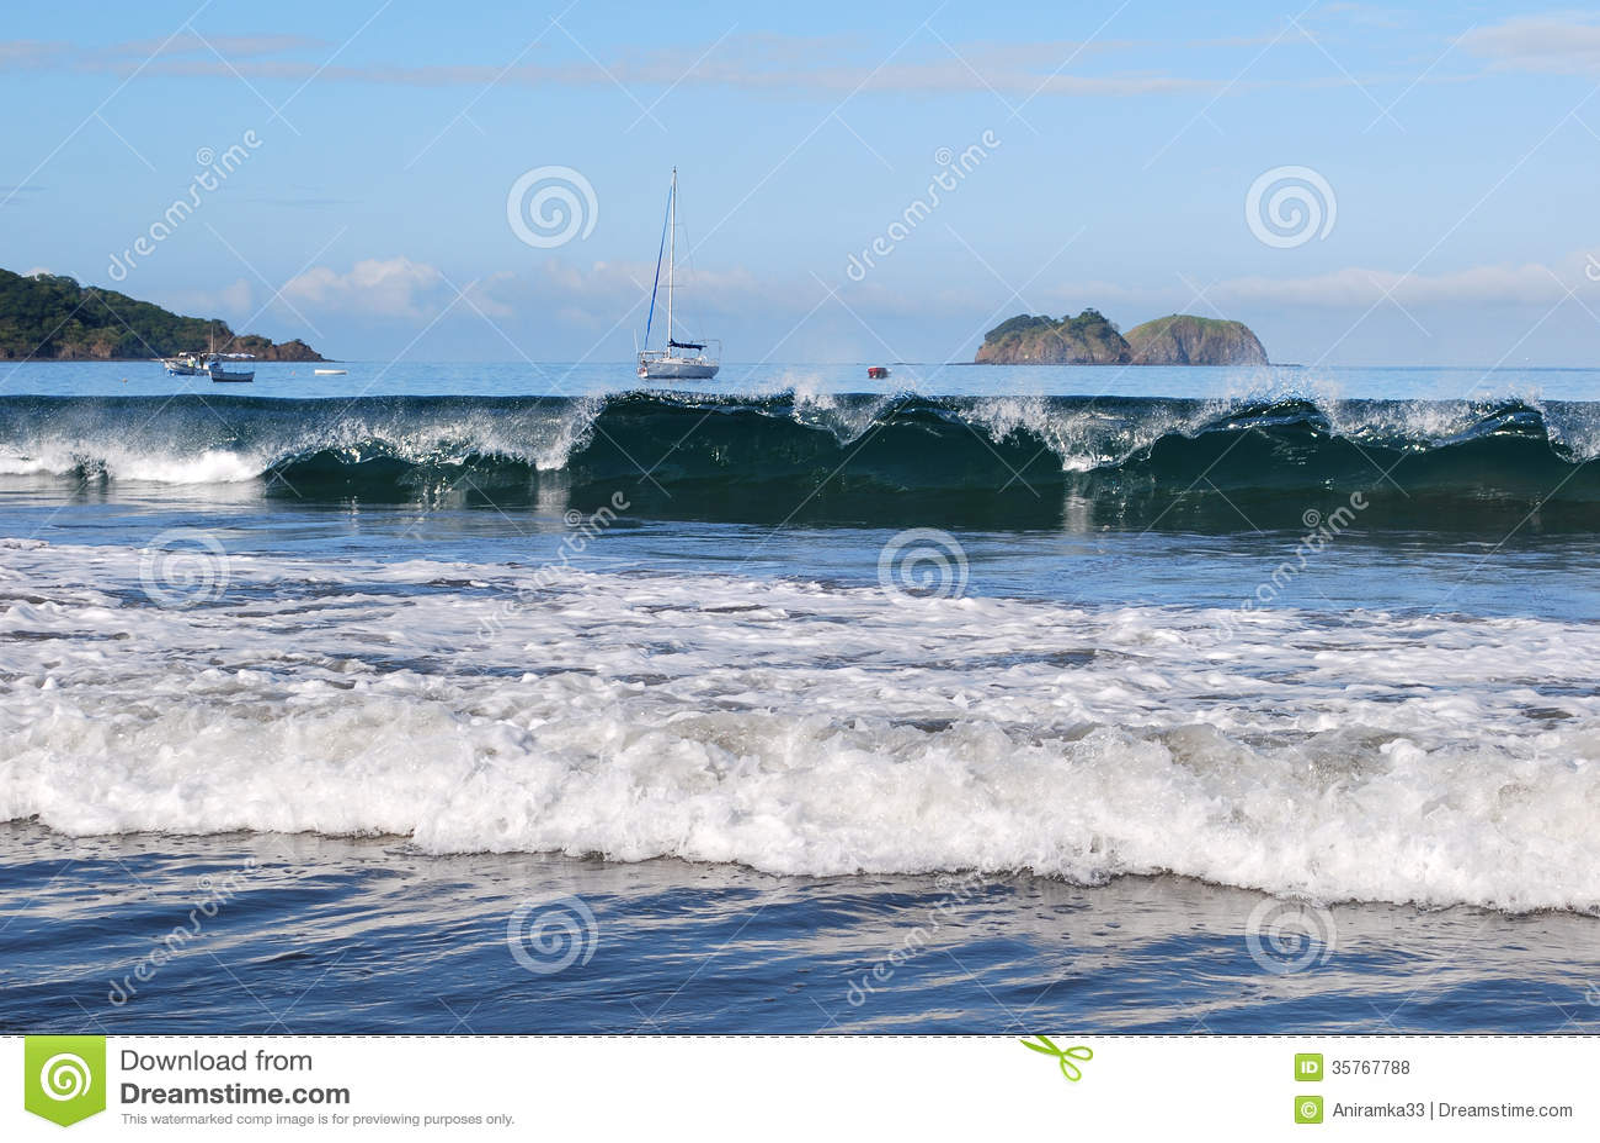 Pacific Ocean Waves Royalty Free Stock Photos - Image ... Pacific Ocean Waves